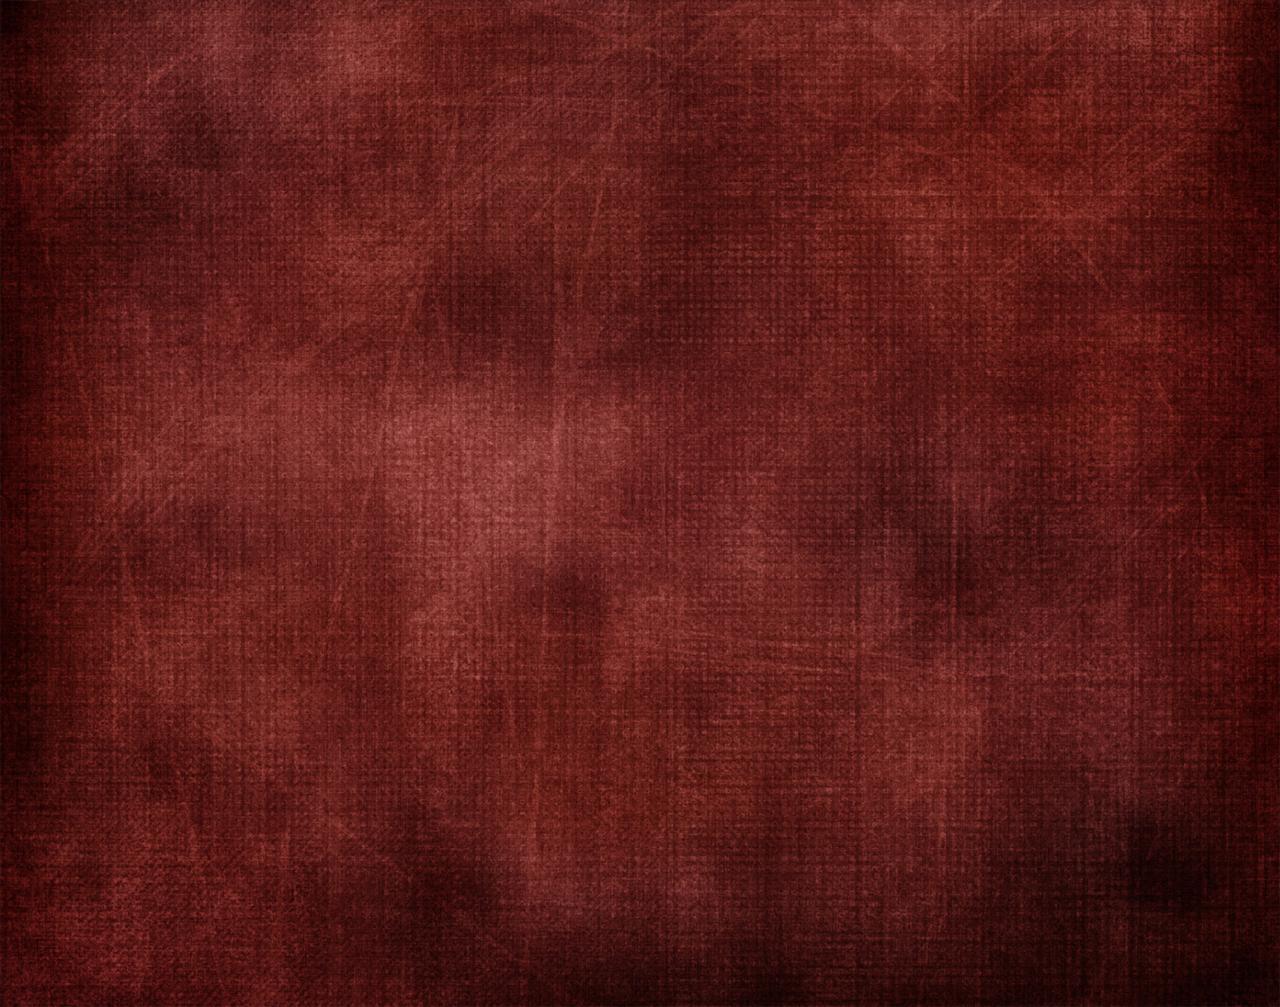 49 Burgundy Wallpaper Background On Wallpapersafari